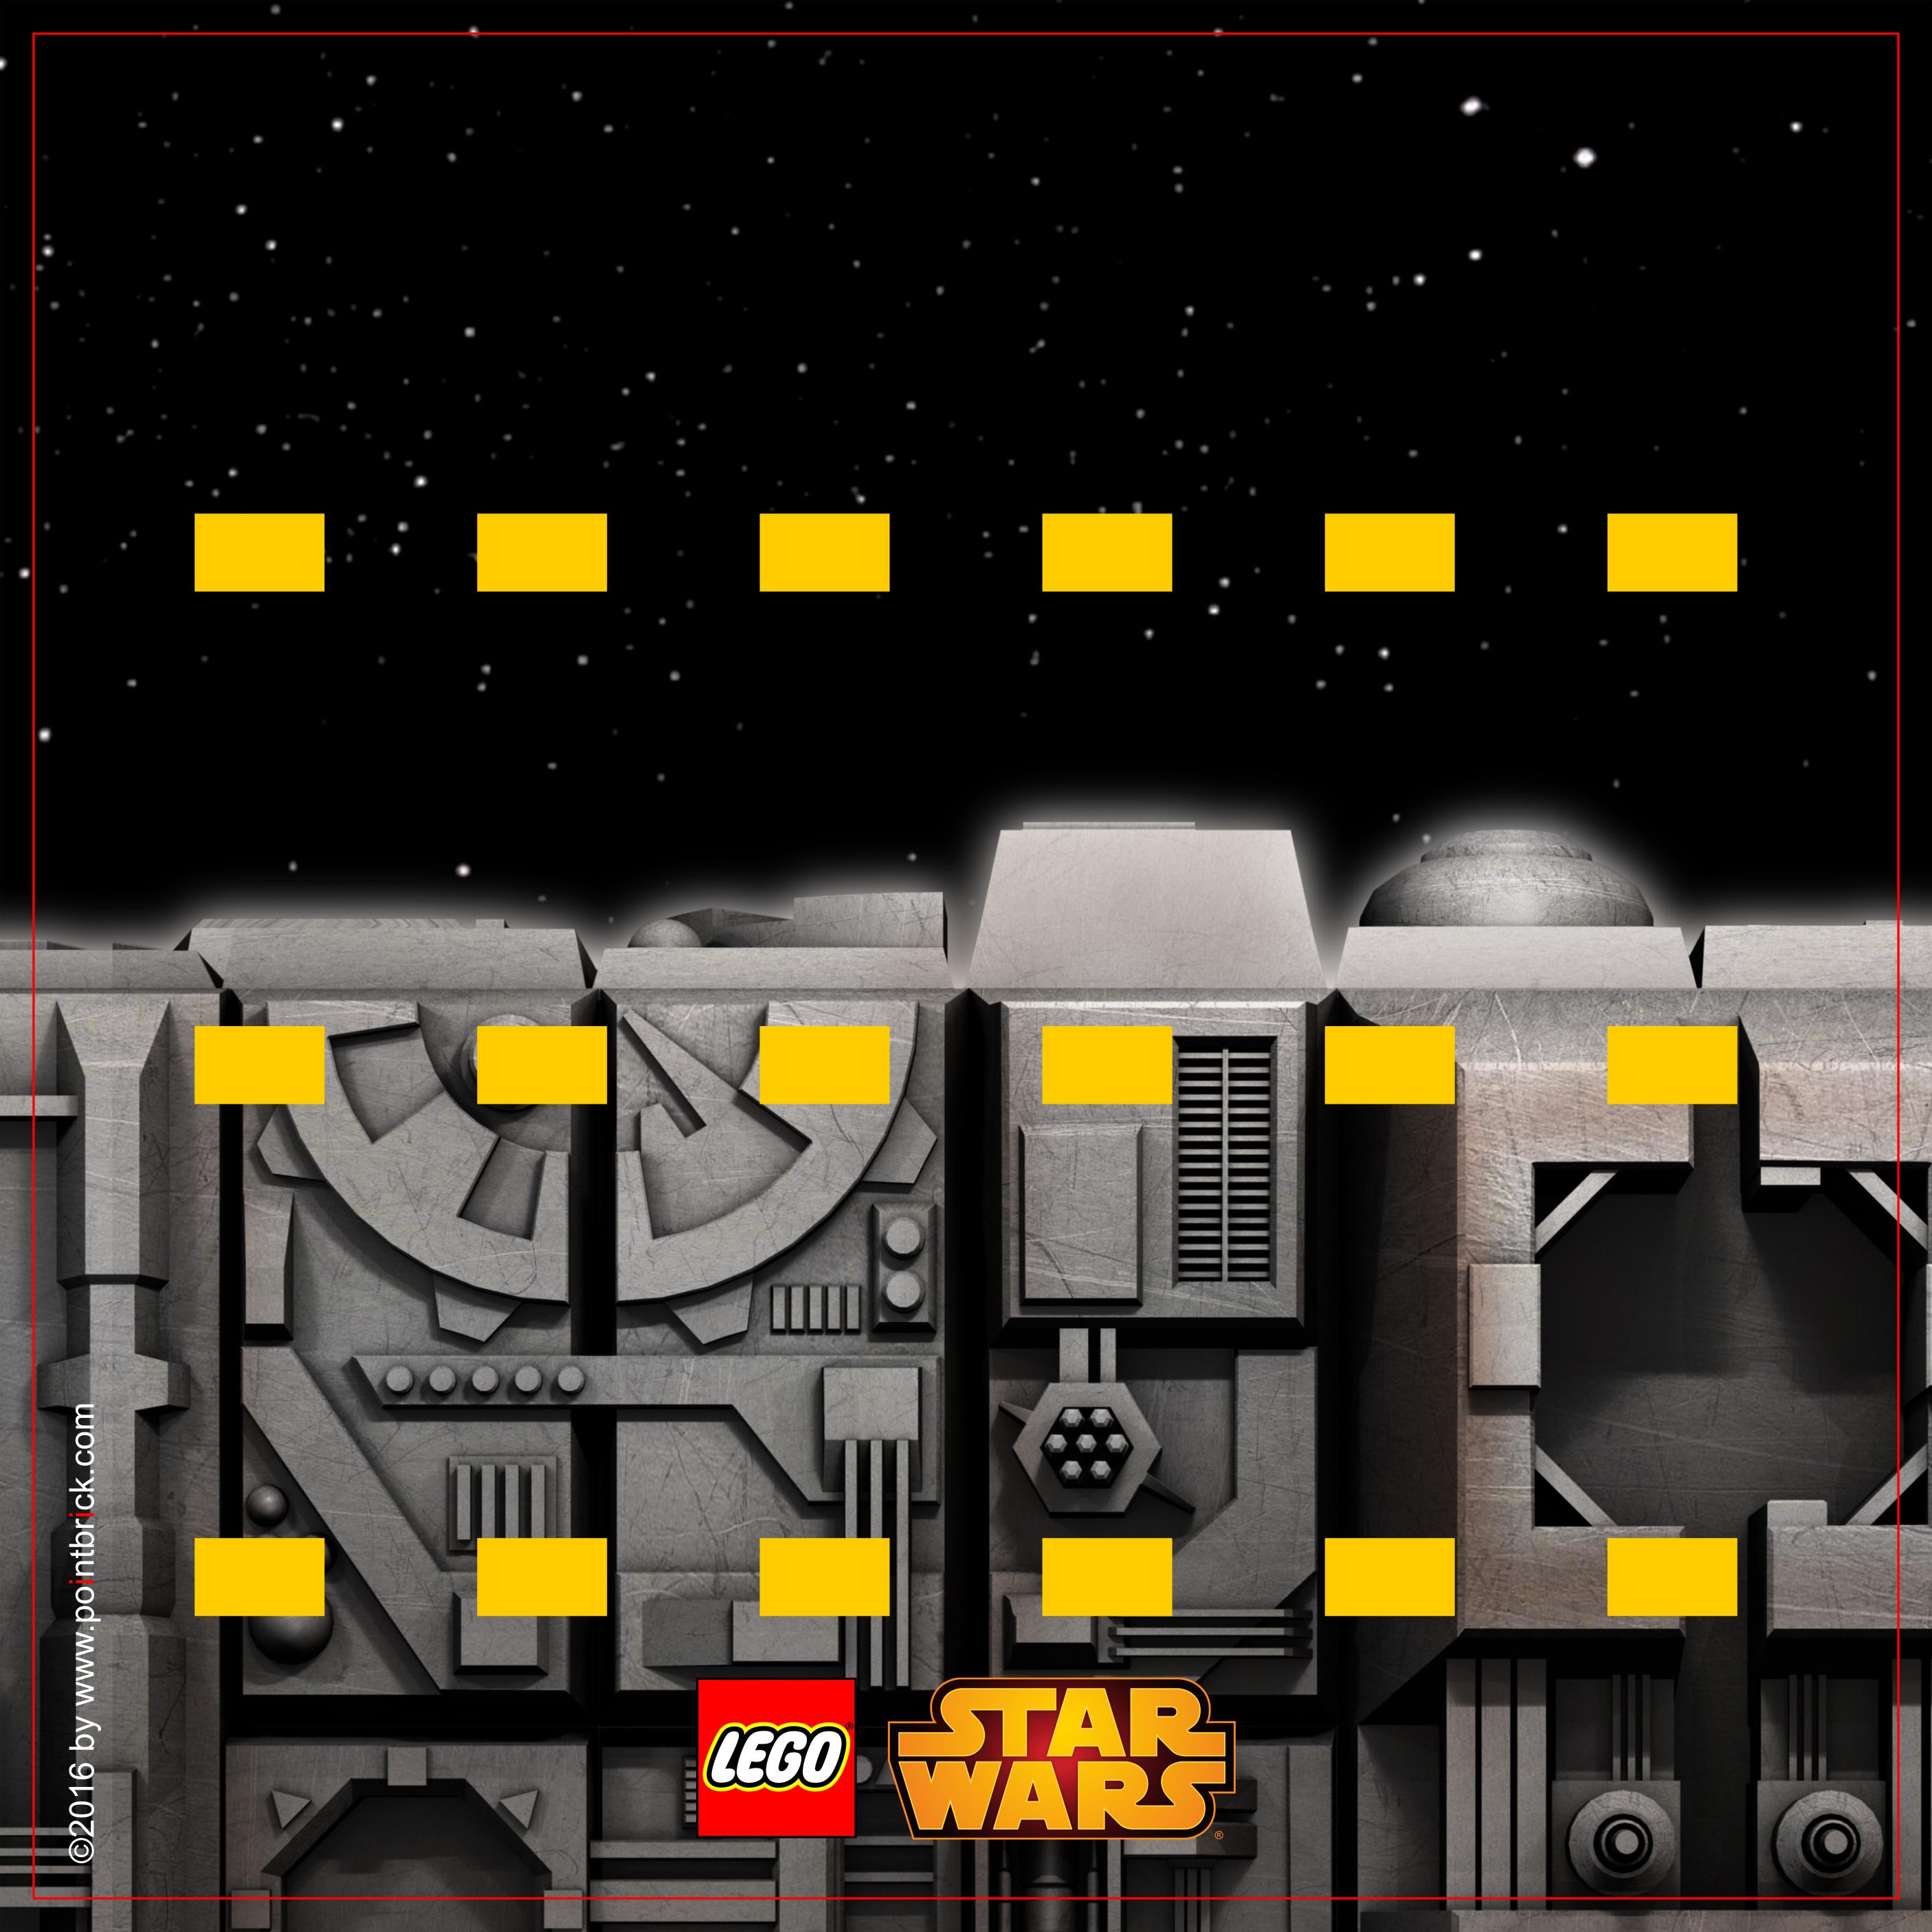 Point Brick Blog Lego Minifigure Display Frame Sfondi